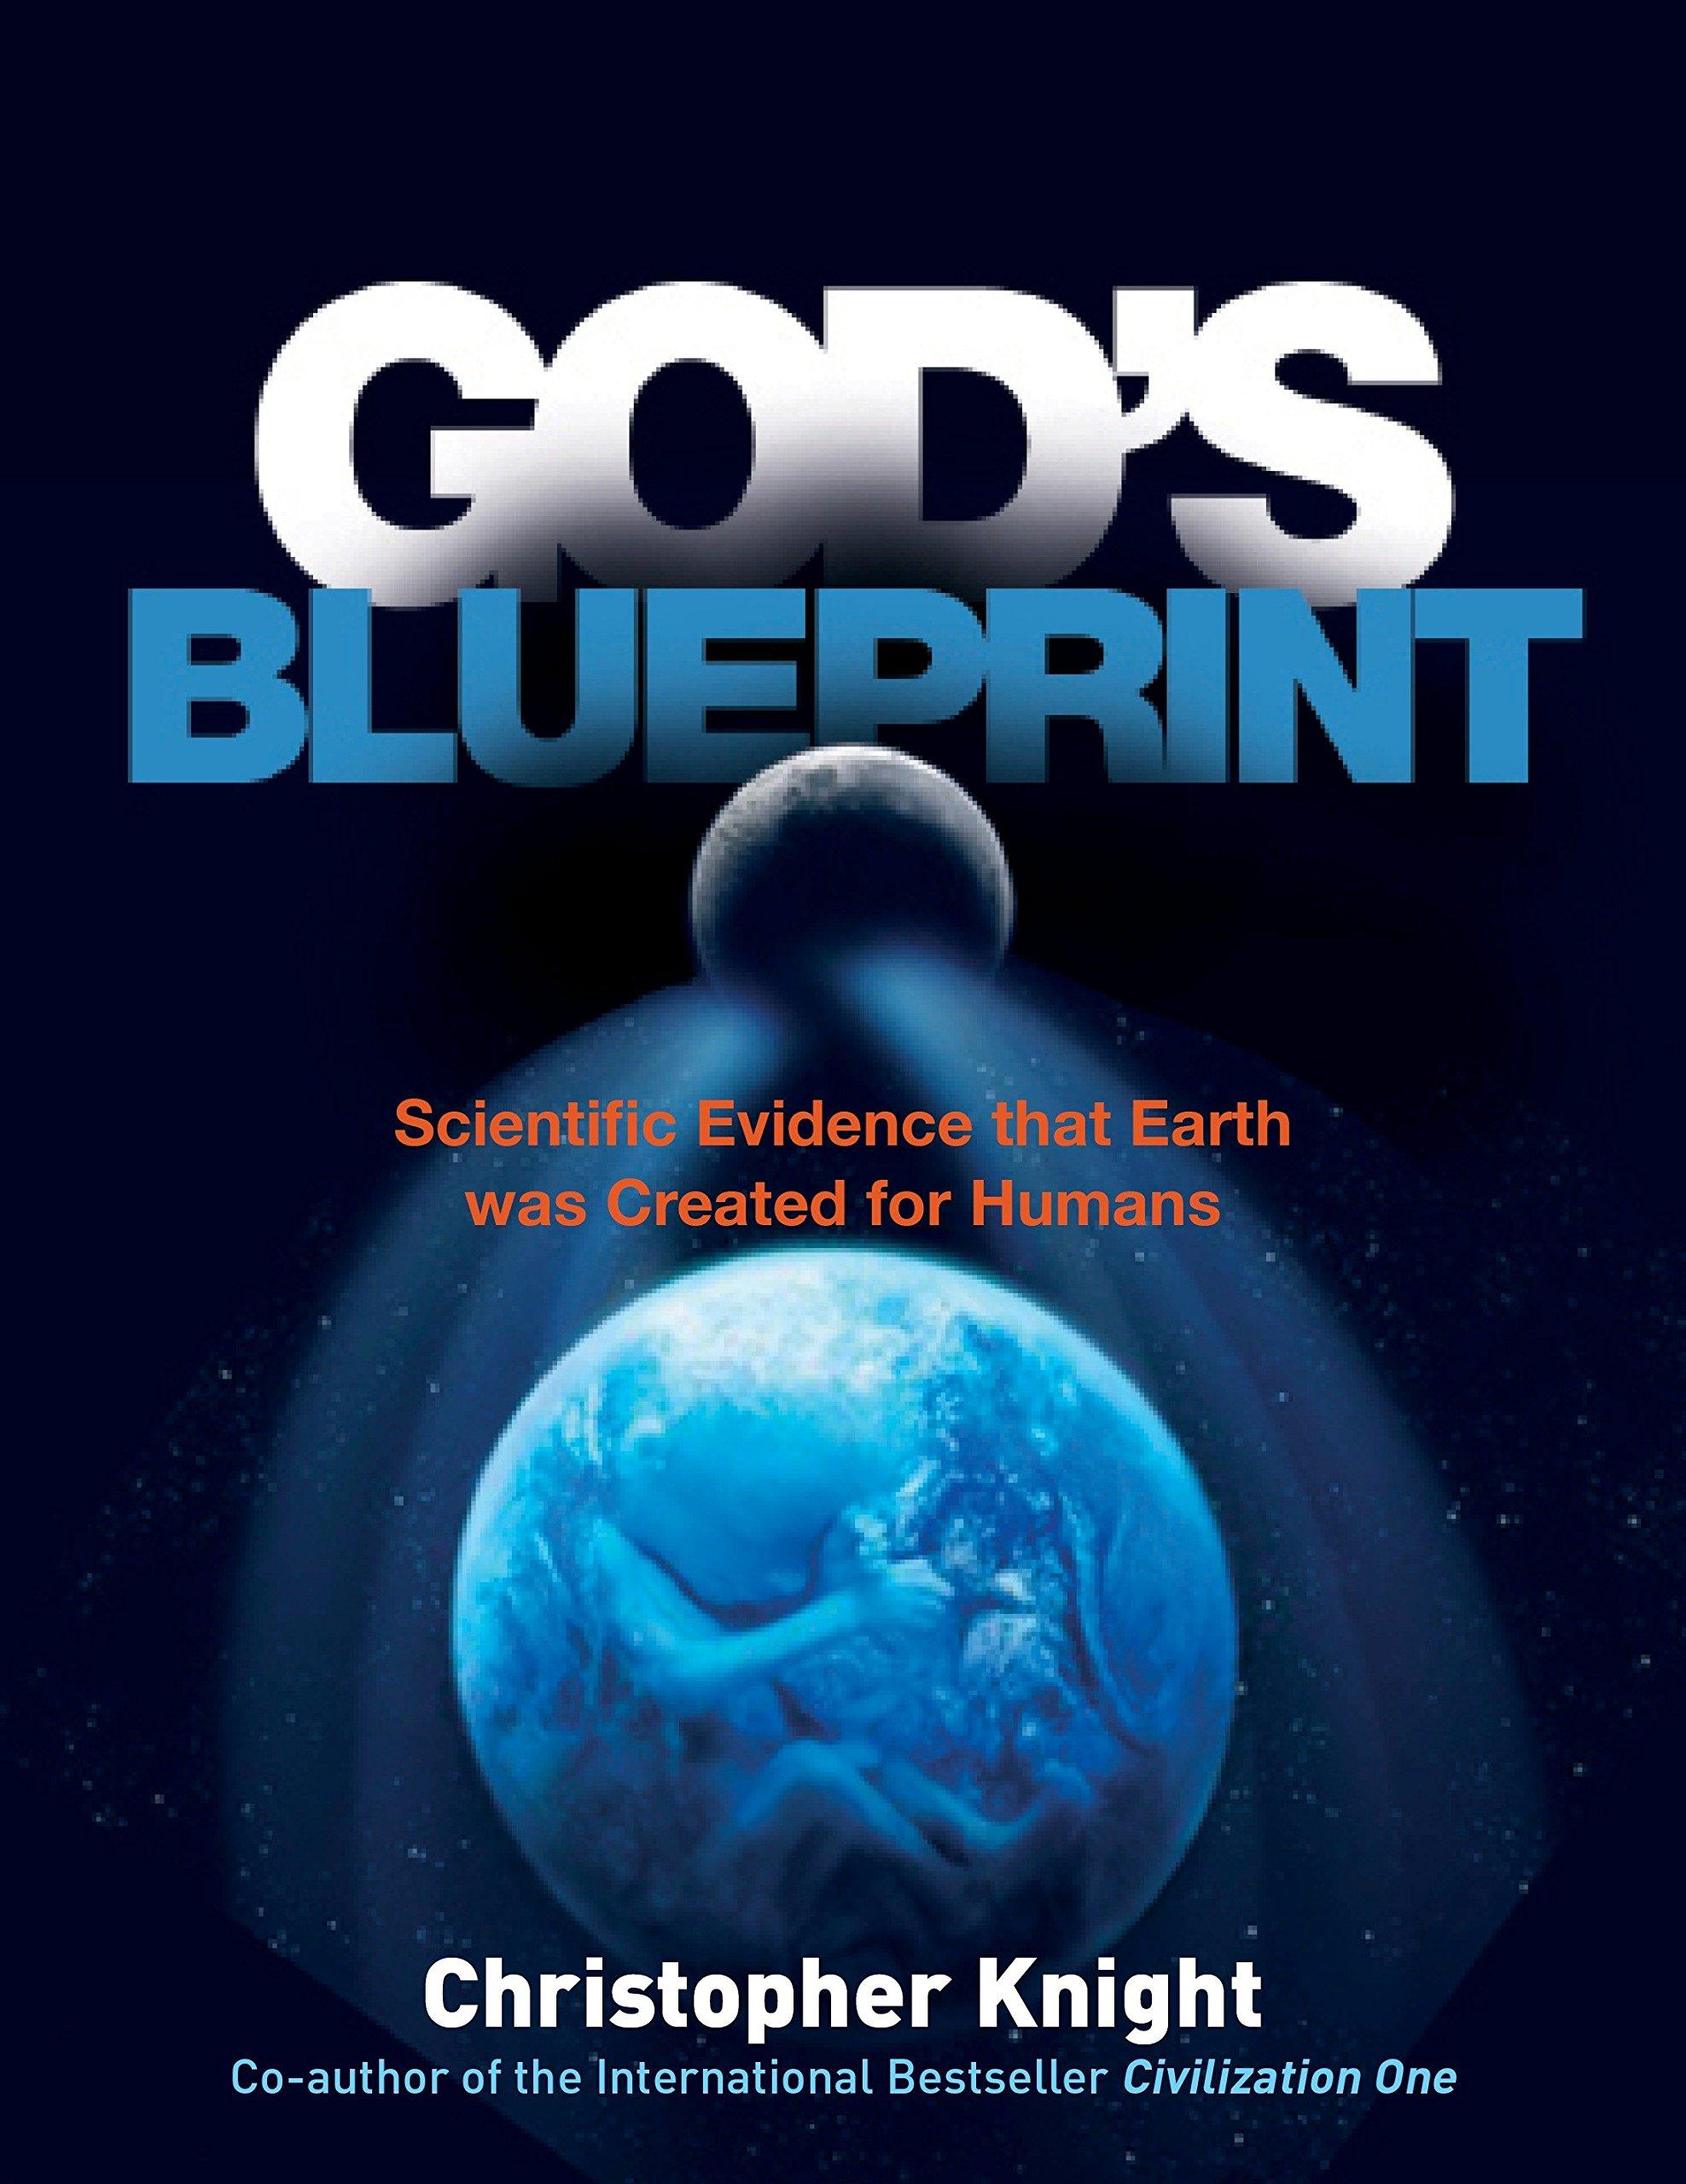 Gods blueprint scientific evidence that the earth was created to gods blueprint scientific evidence that the earth was created to produce humans christopher knight 9781780287492 amazon books malvernweather Choice Image